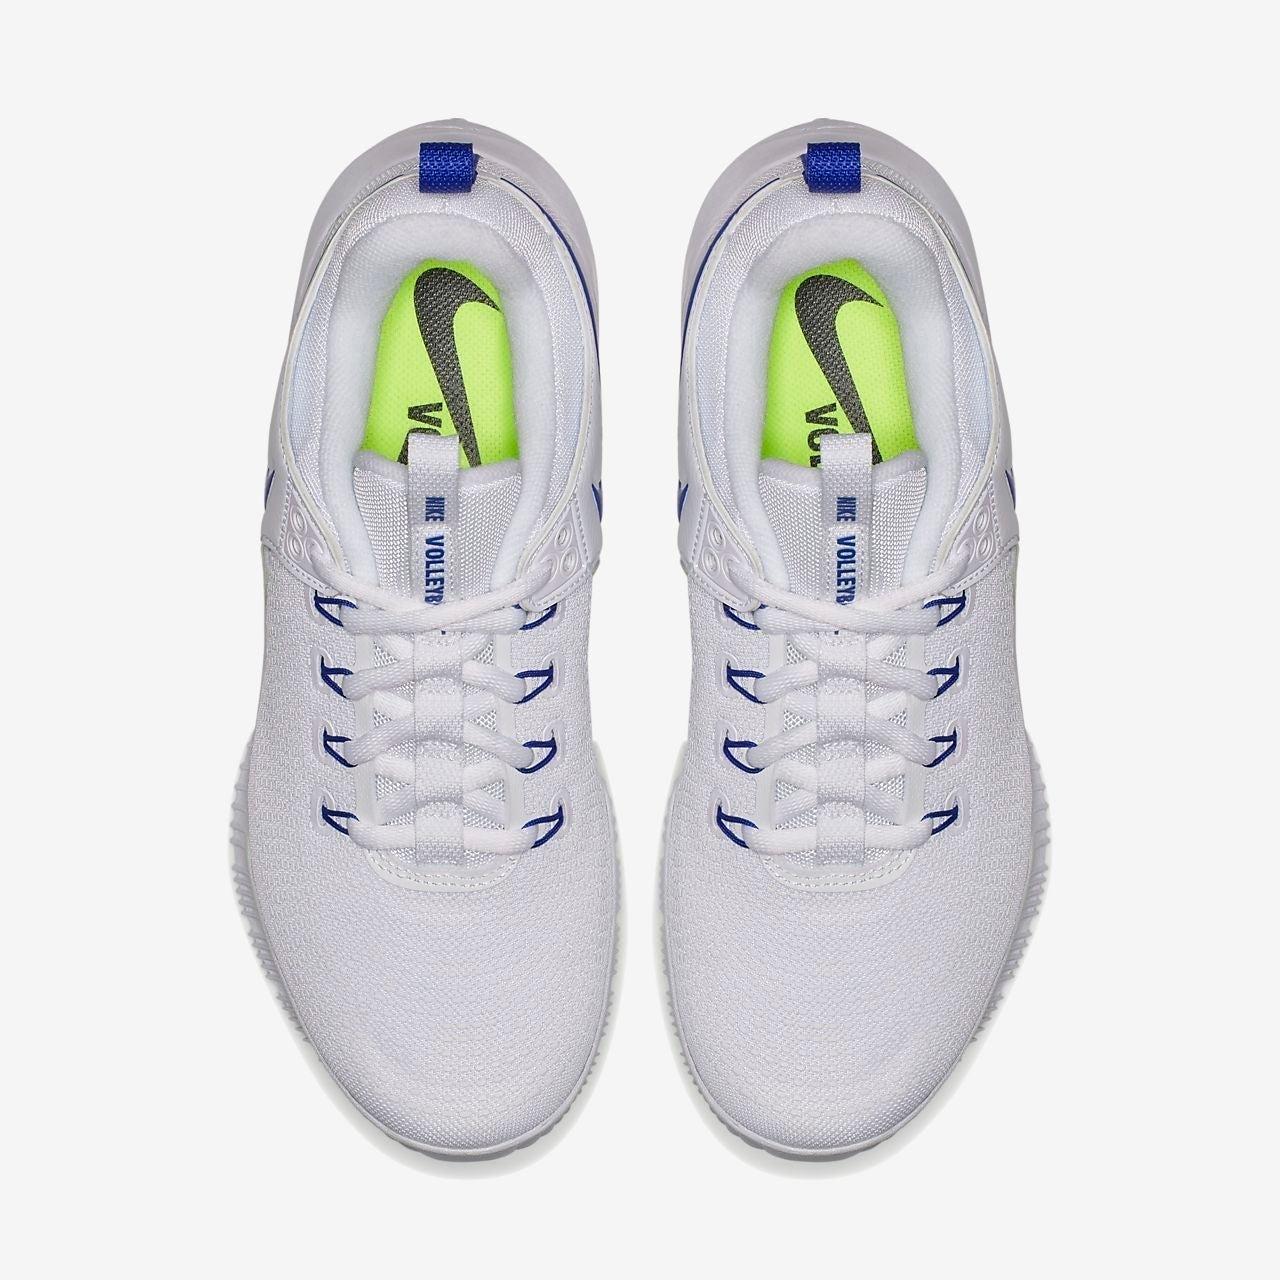 Nike Air Zoom Hyperace Athletic Shoes | Mercari